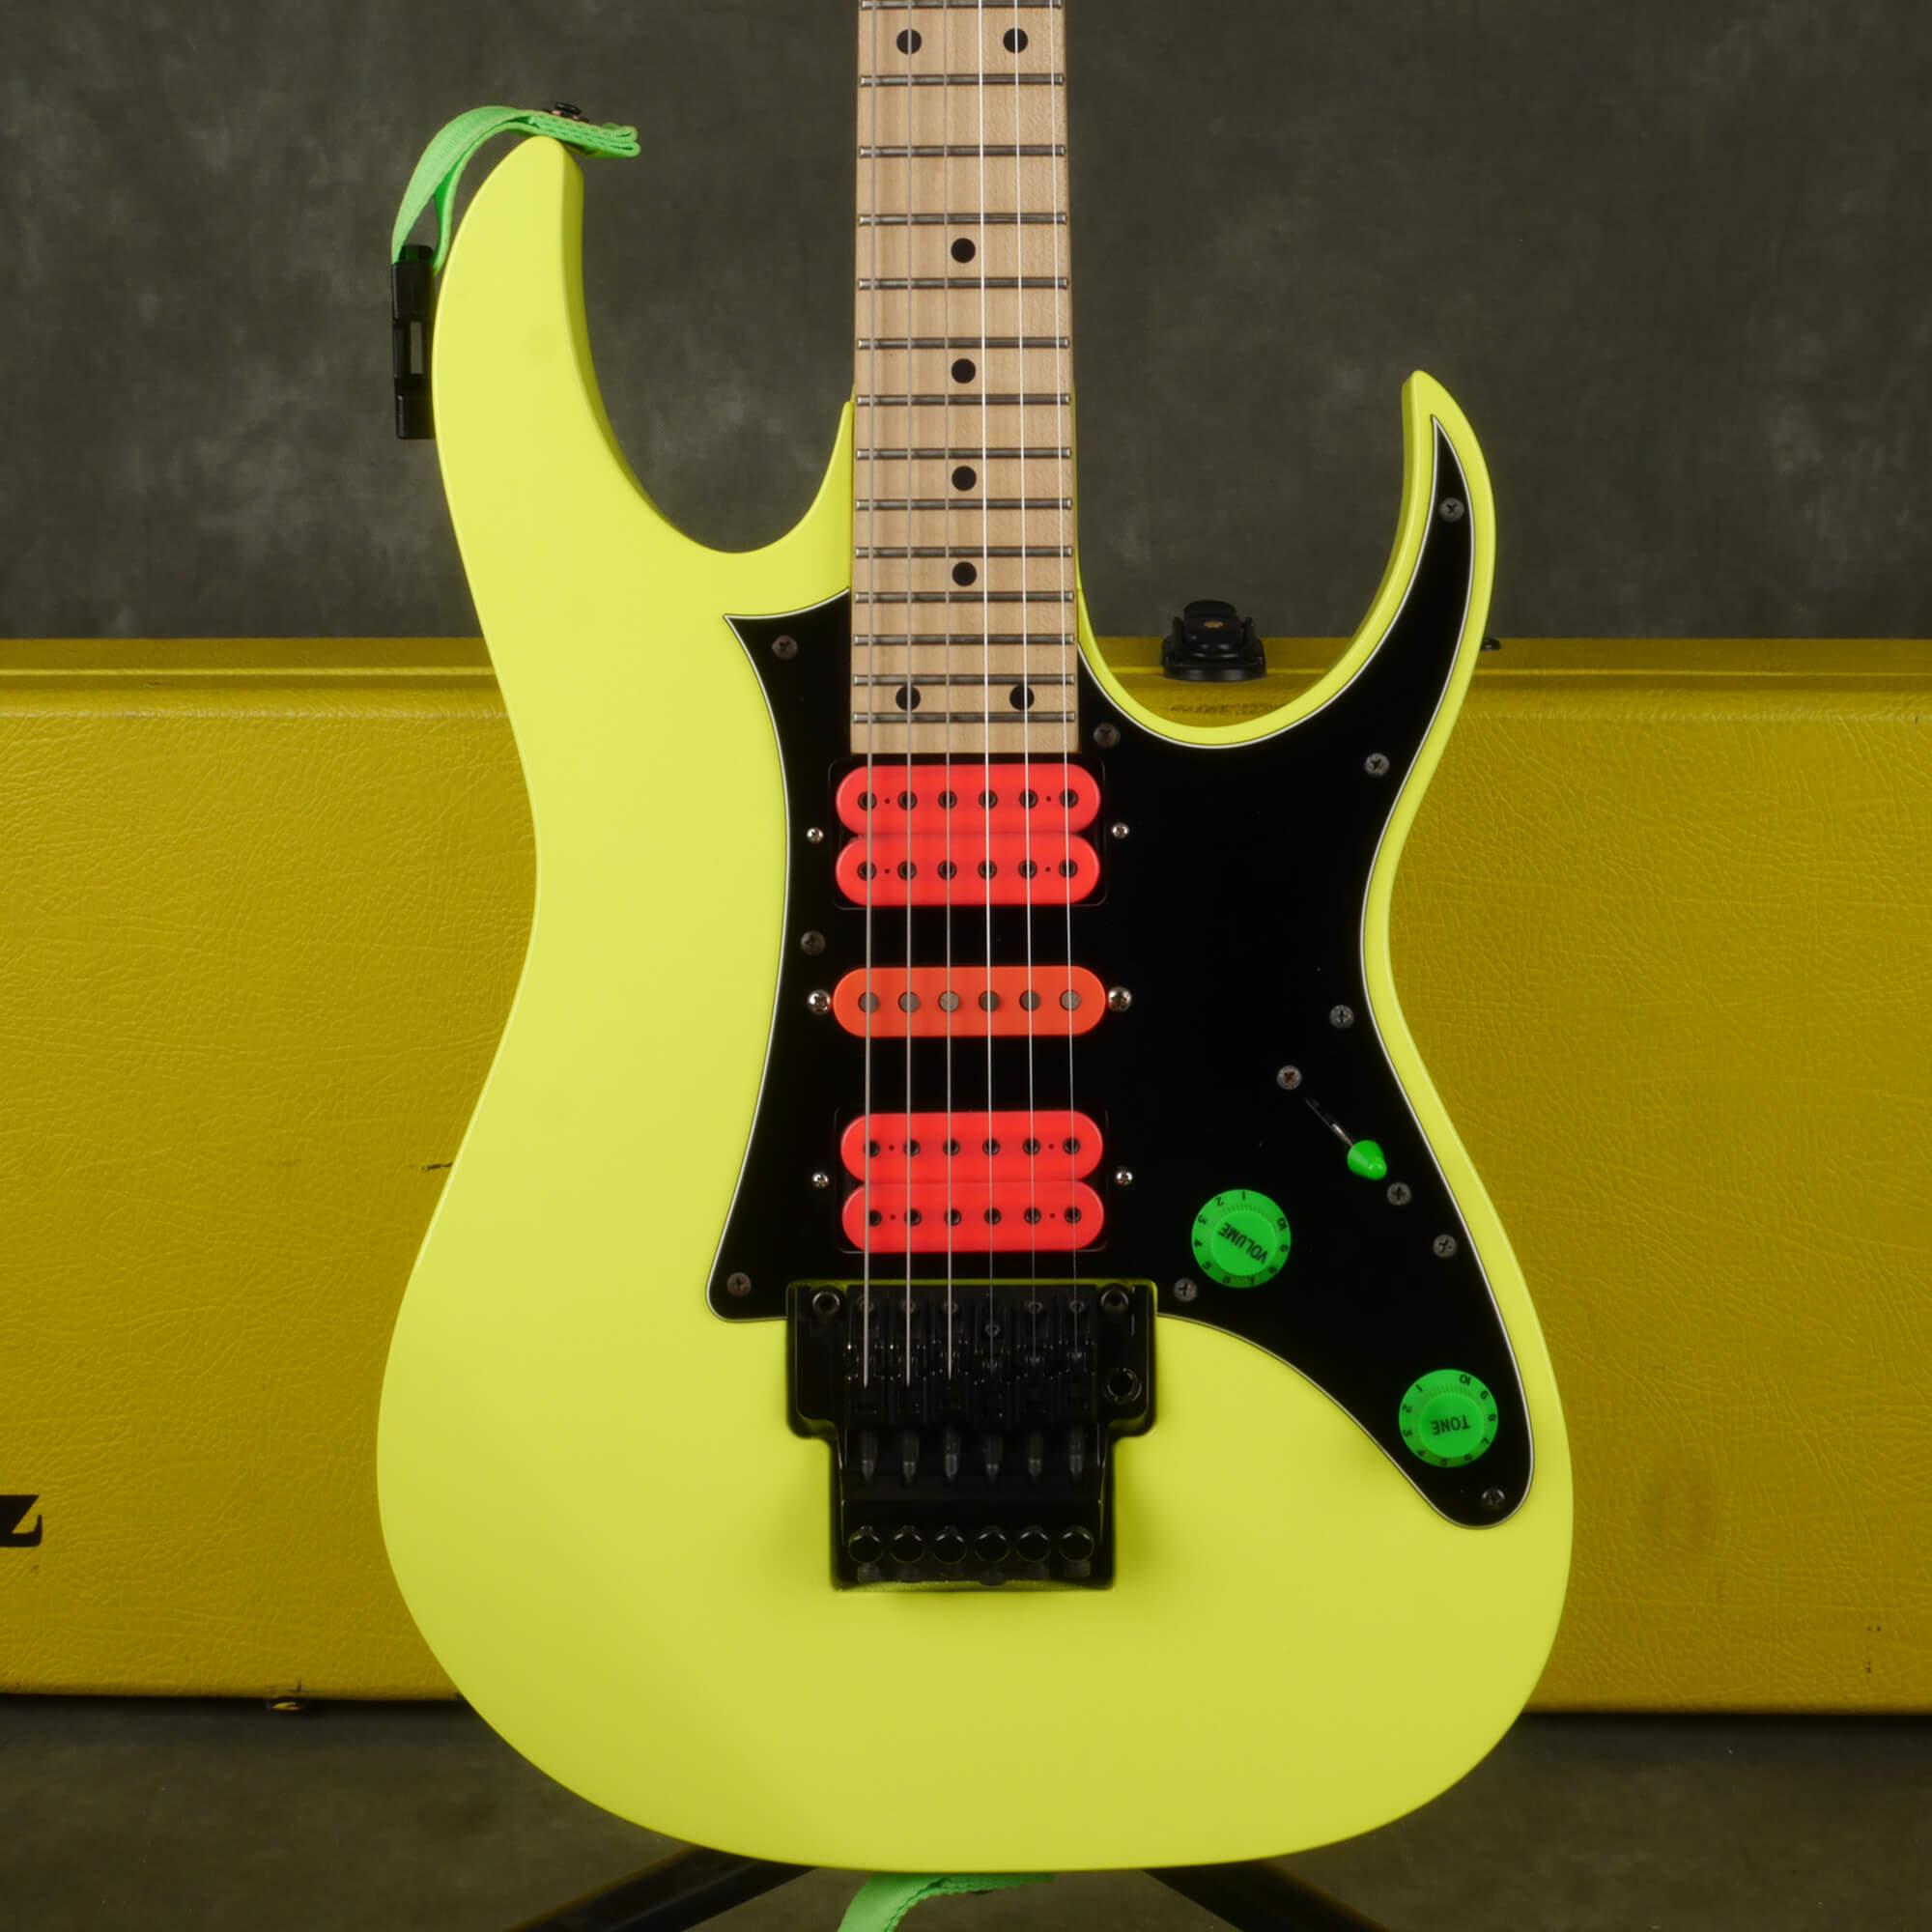 Ibanez RG550MMX 20th Anniversary Guitar - Desert Sun Yellow w/Case - 2nd Hand